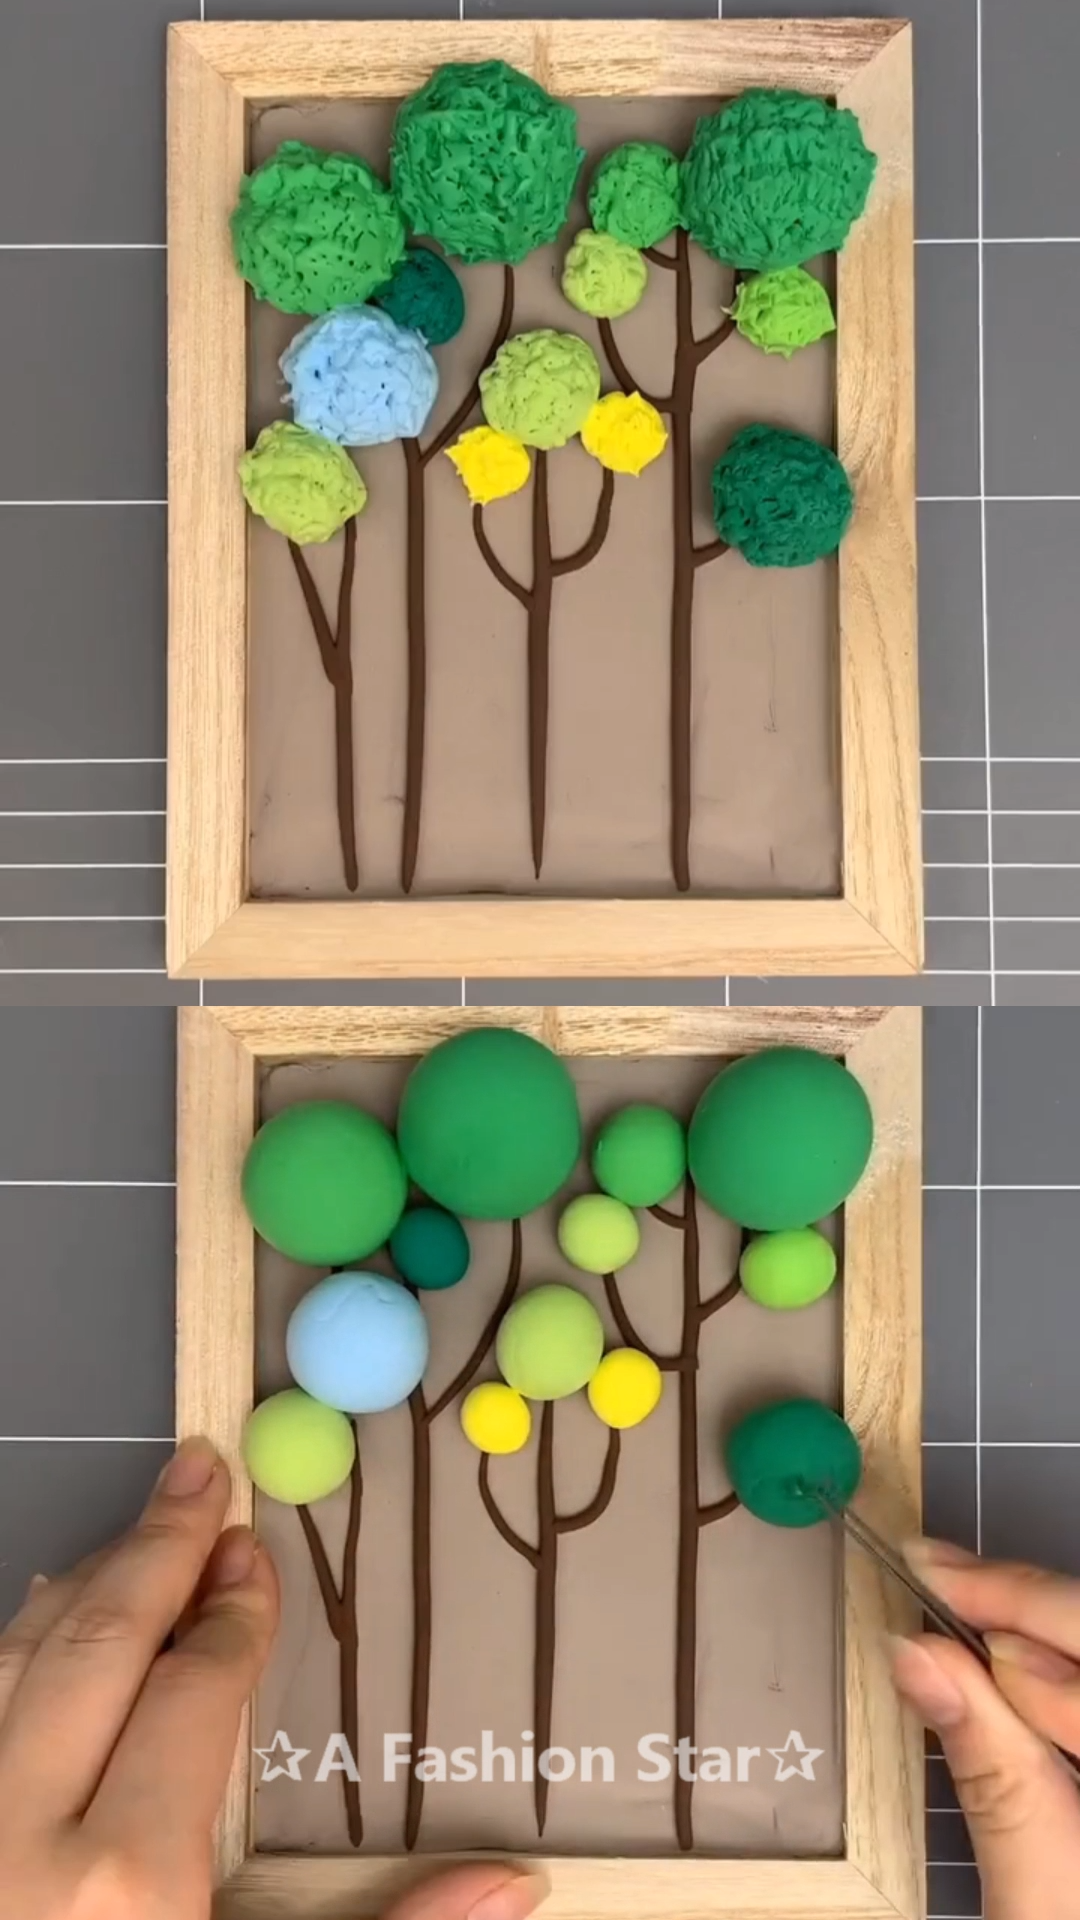 10 Easy Crafts Fun Activities For Kids – DIY Kid Crafts #easycrafts